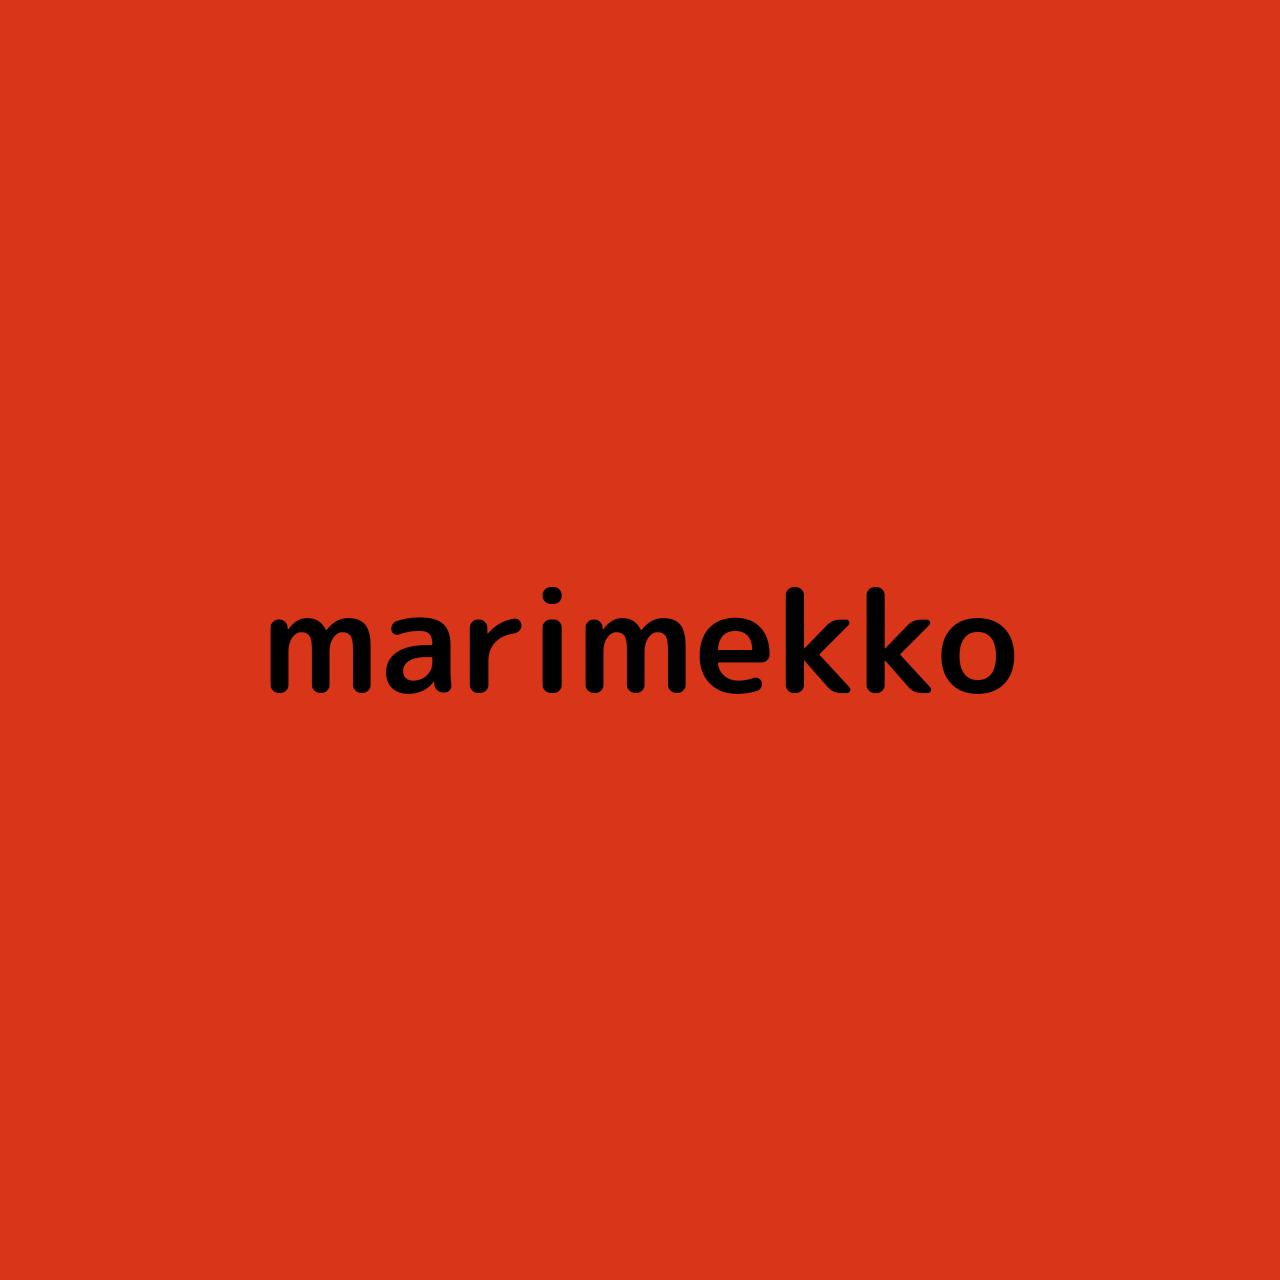 【marimekko】SHOP LEI取扱いブランドの紹介